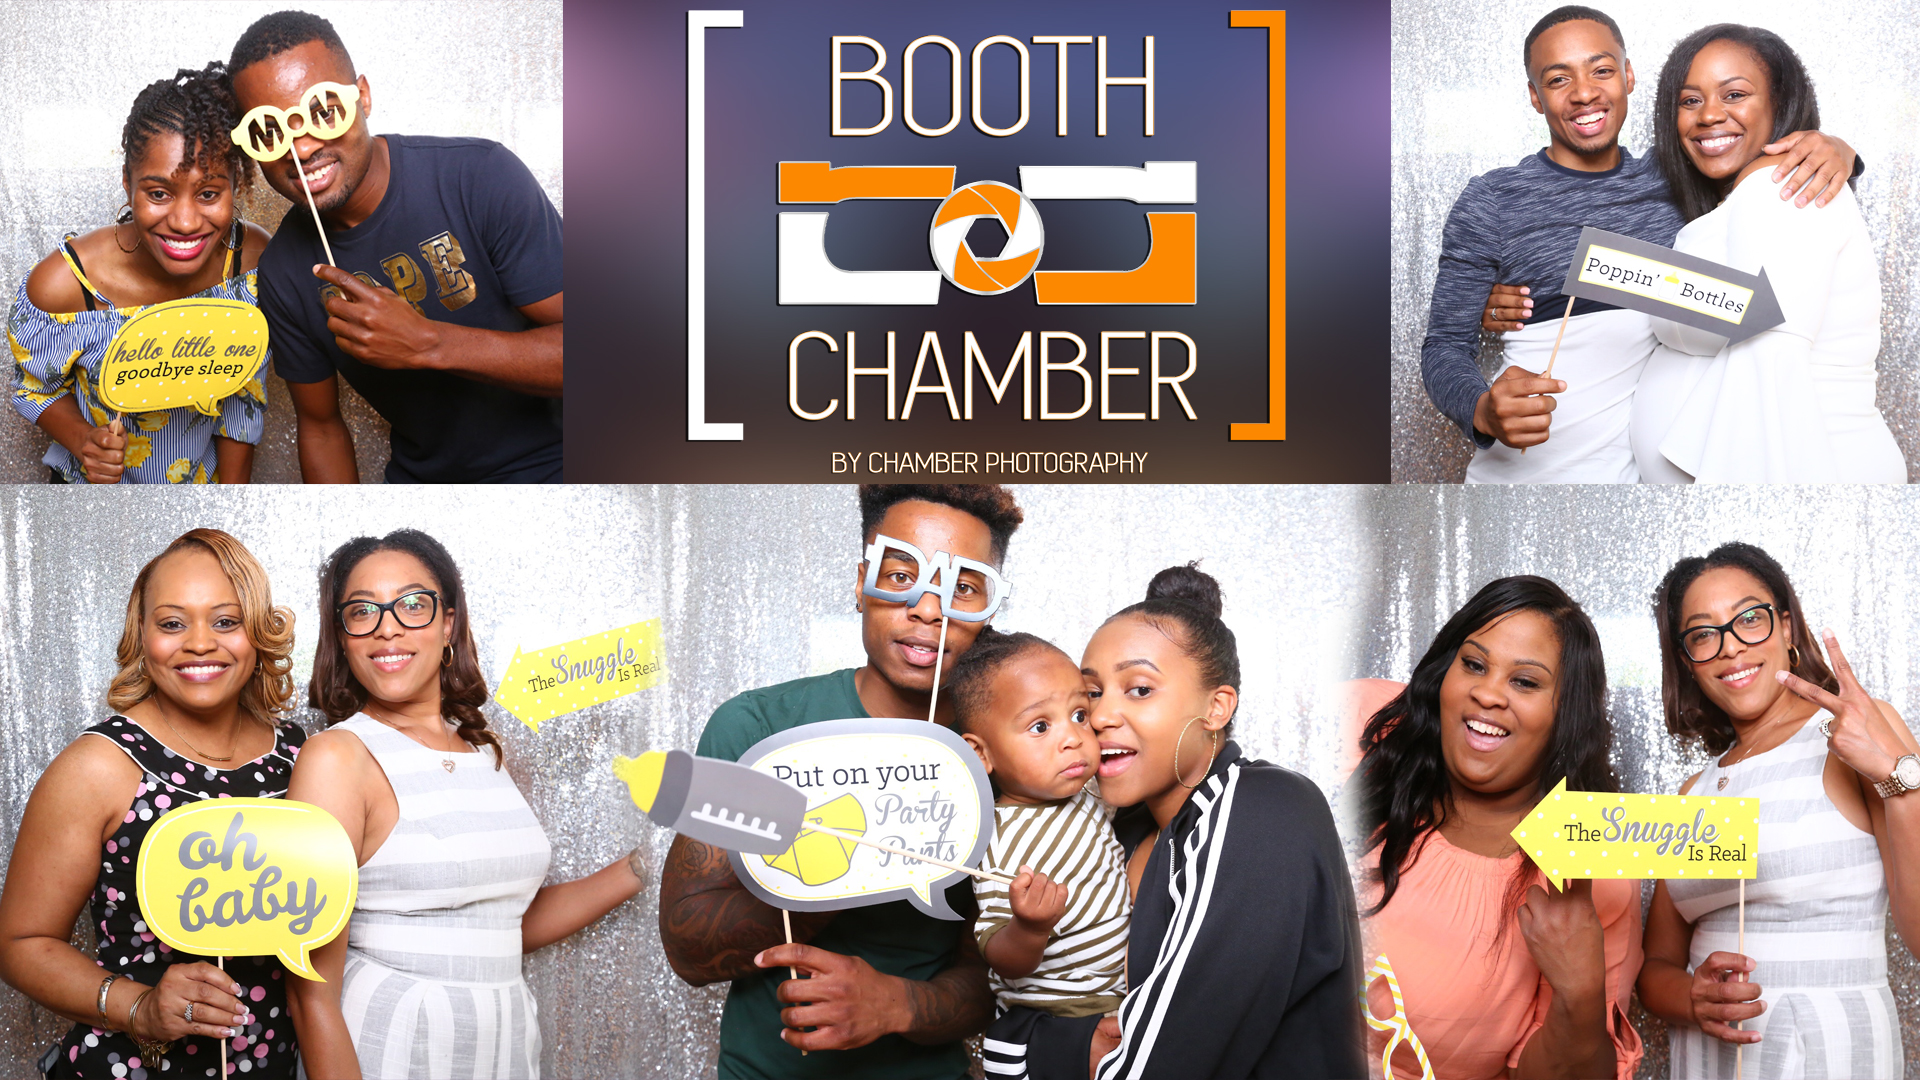 booth-chamber-photo-booth-chamber-photography-orlando-florida.jpg